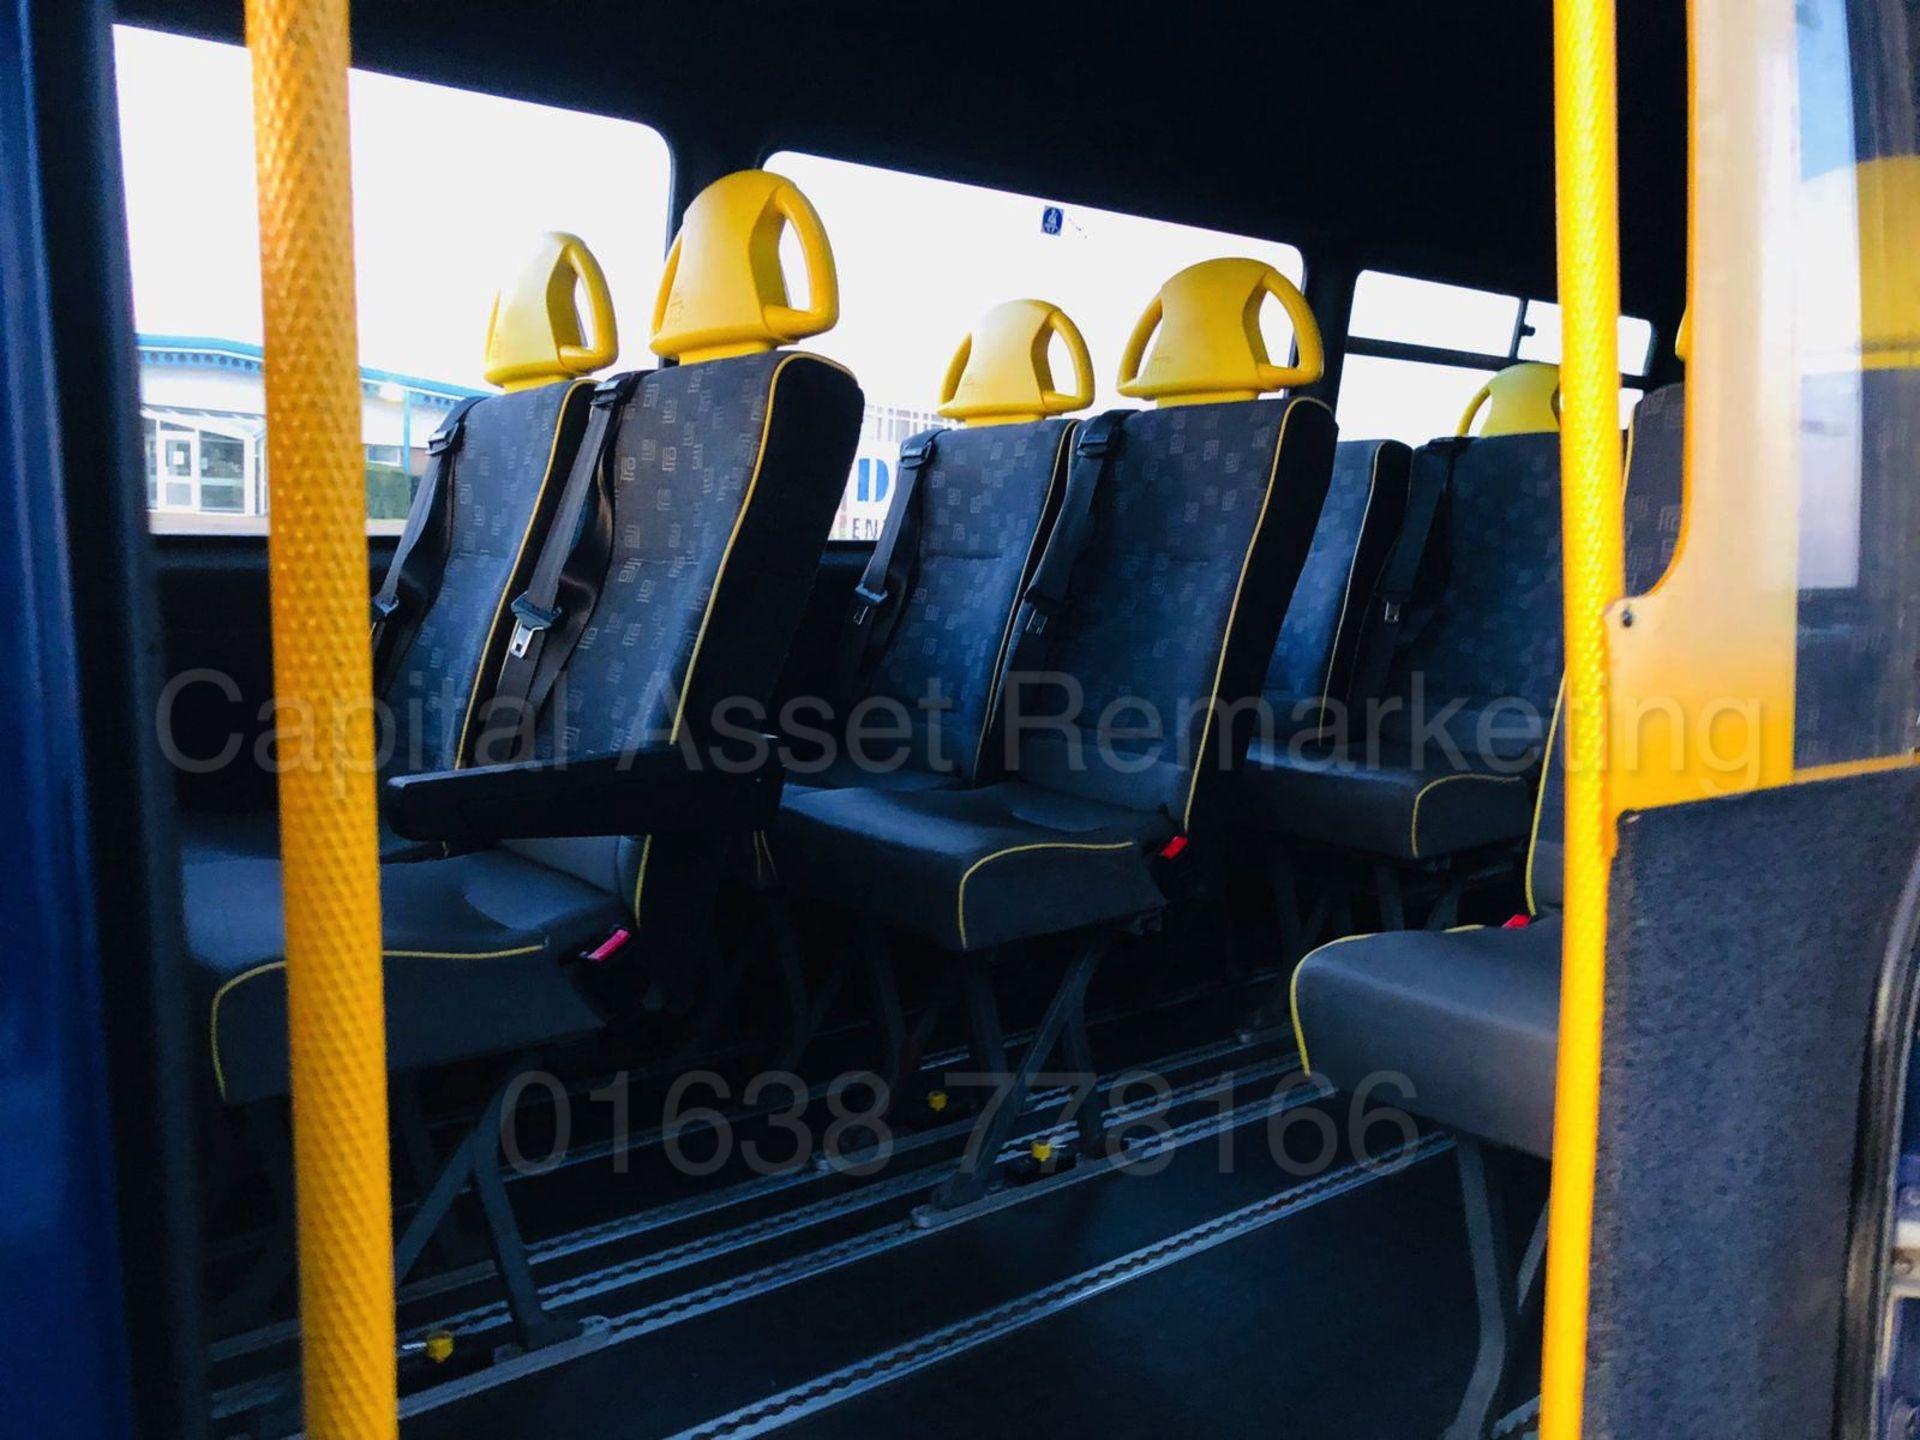 Lot 28 - MERCEDES SPRINTER 411 CDI *LWB - 16 SEATER MINI-BUS* (2006) 'QUICK RELEASE SEATS - WHEEL CHAIR LIFT*